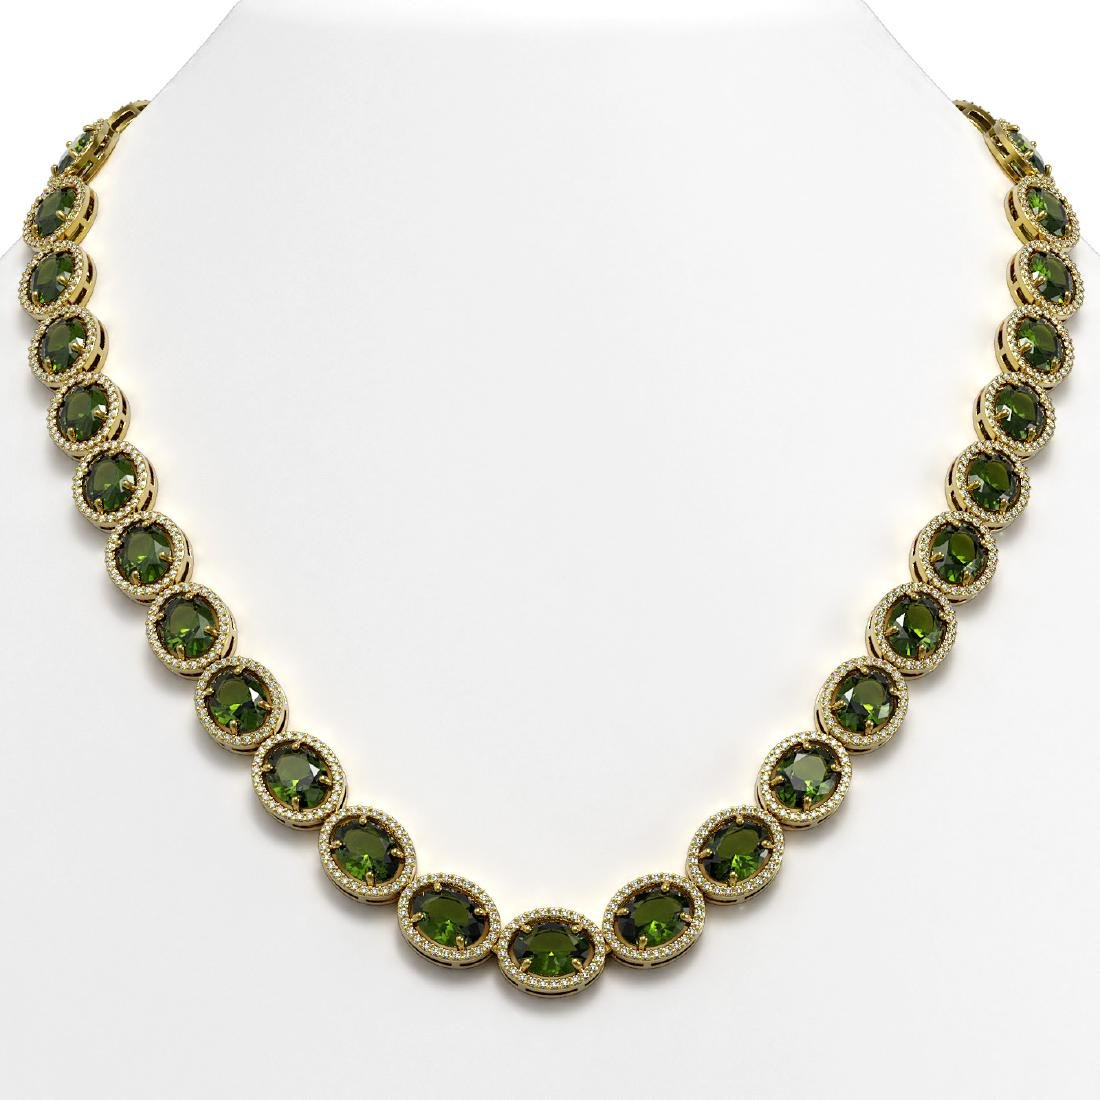 54.48 CTW Tourmaline & Diamond Halo Necklace 10K Yellow